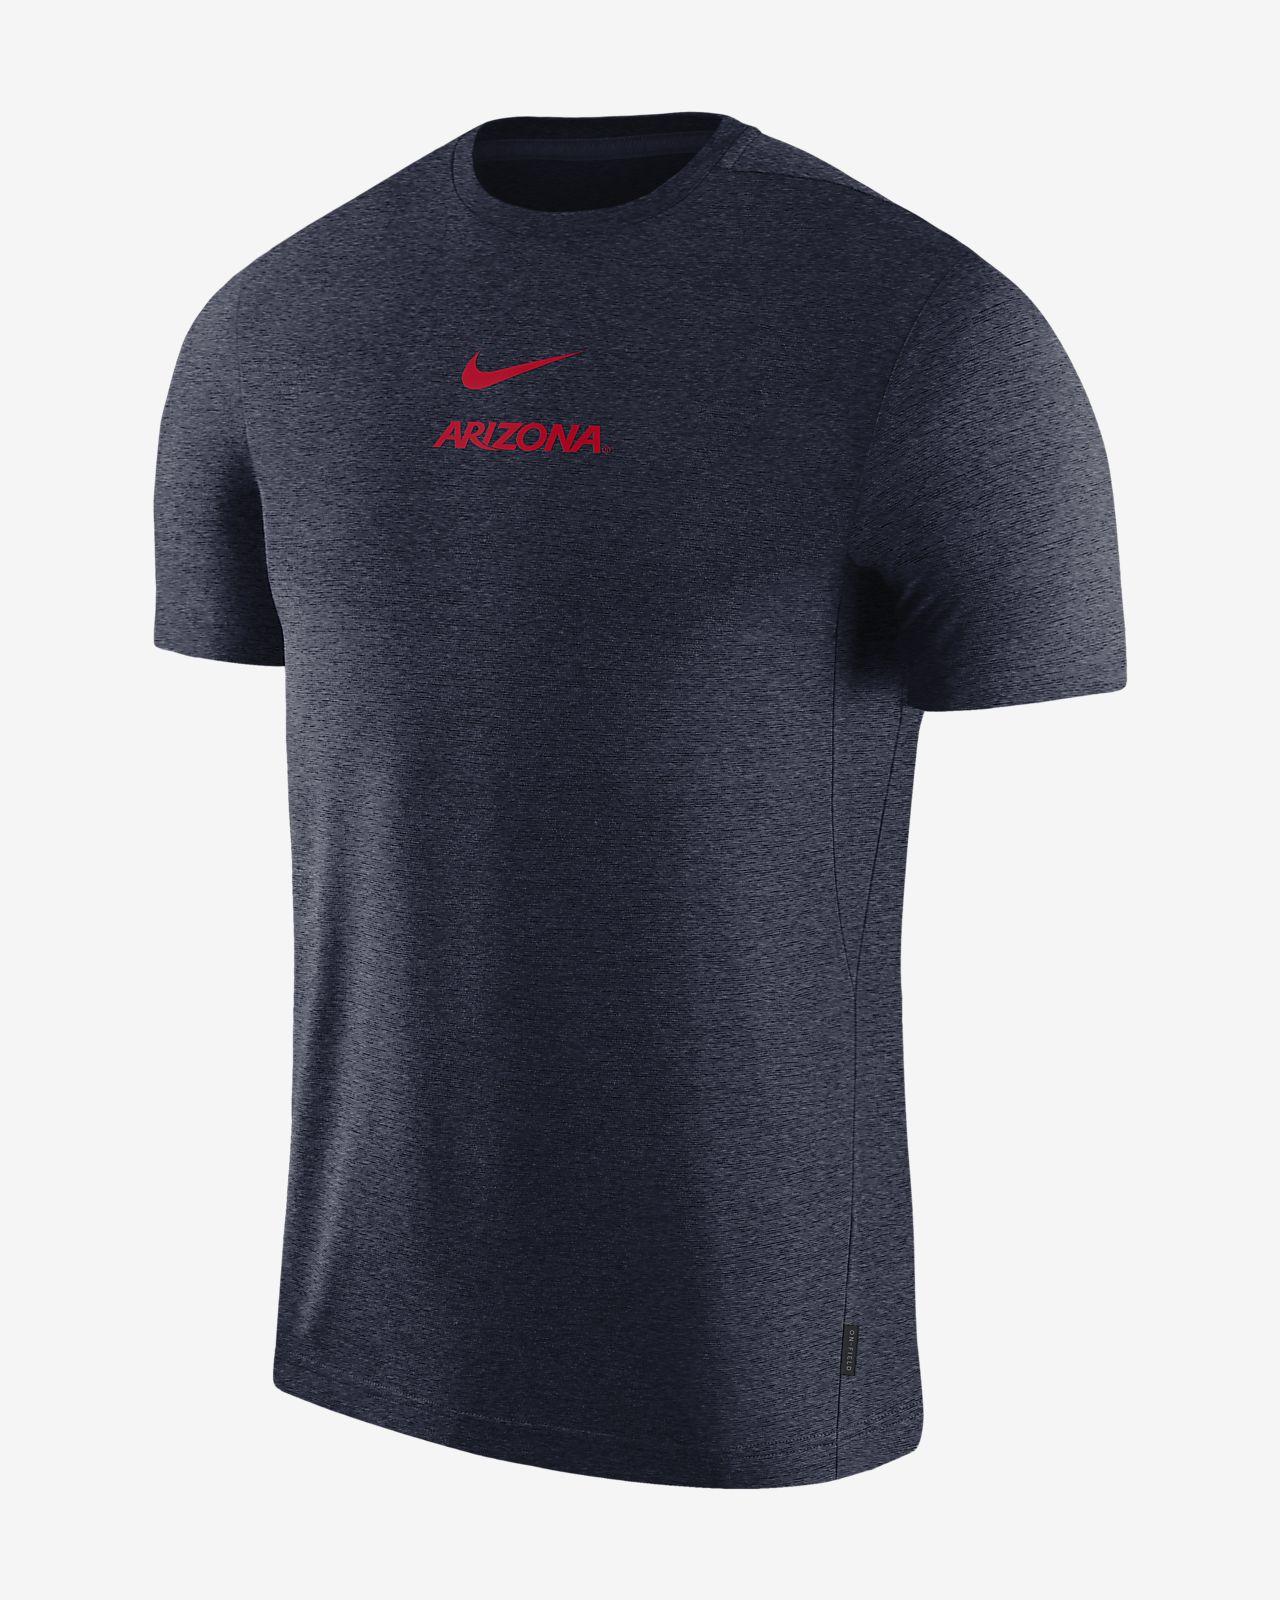 Nike College Dri-FIT Coach (Arizona) Men's Short-Sleeve Top